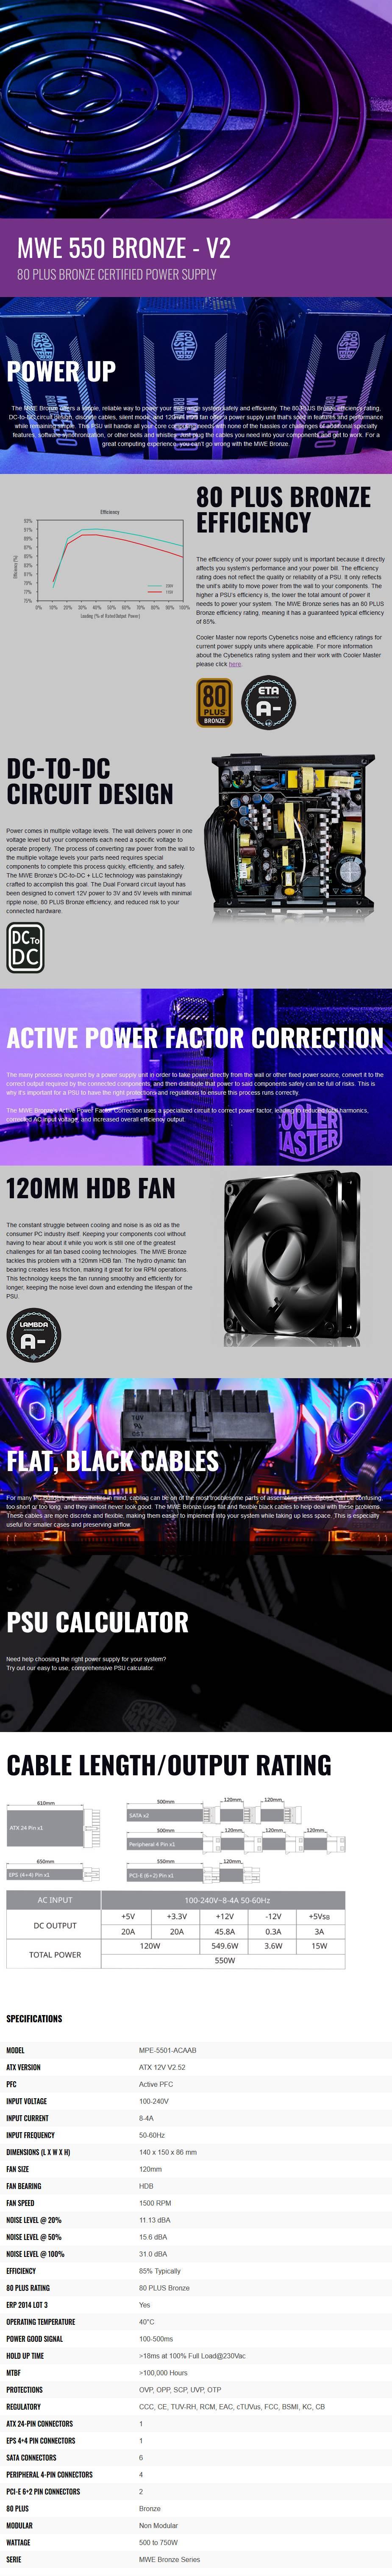 cooler-master-mwe-v2-550w-80-bronze-nonmodular-power-supply-ac33707-6.jpg